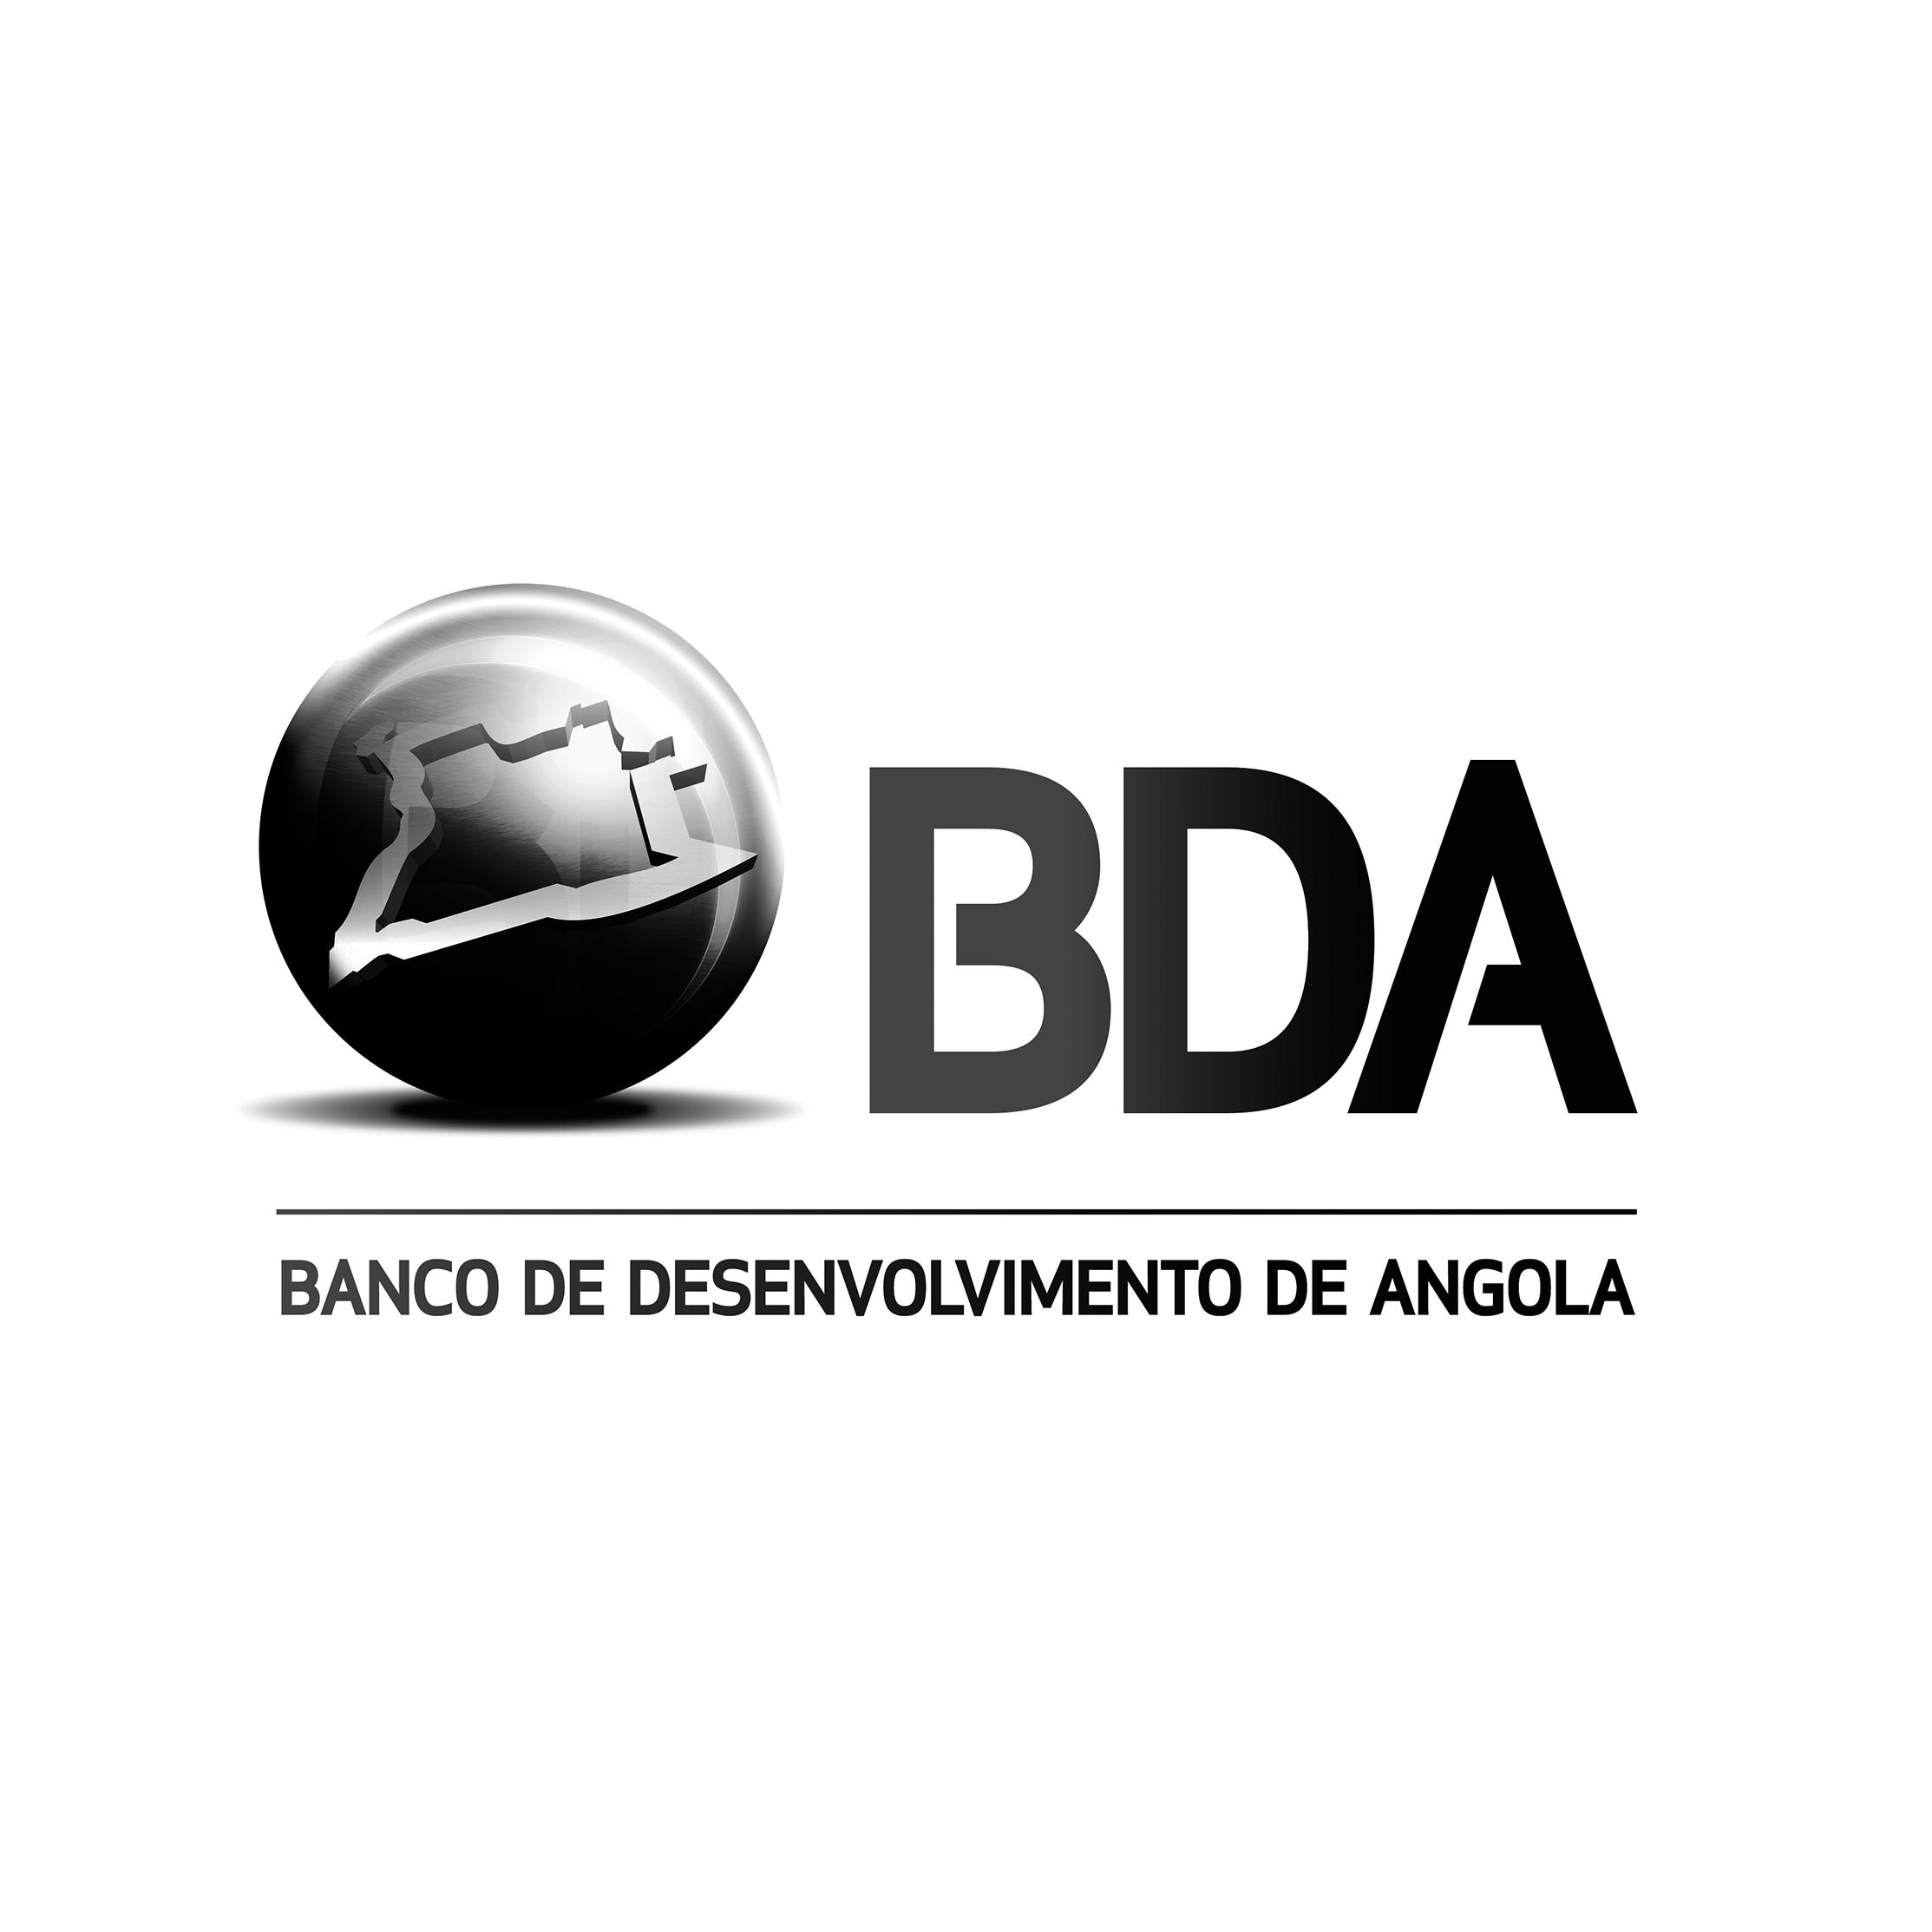 bda_banca.jpg